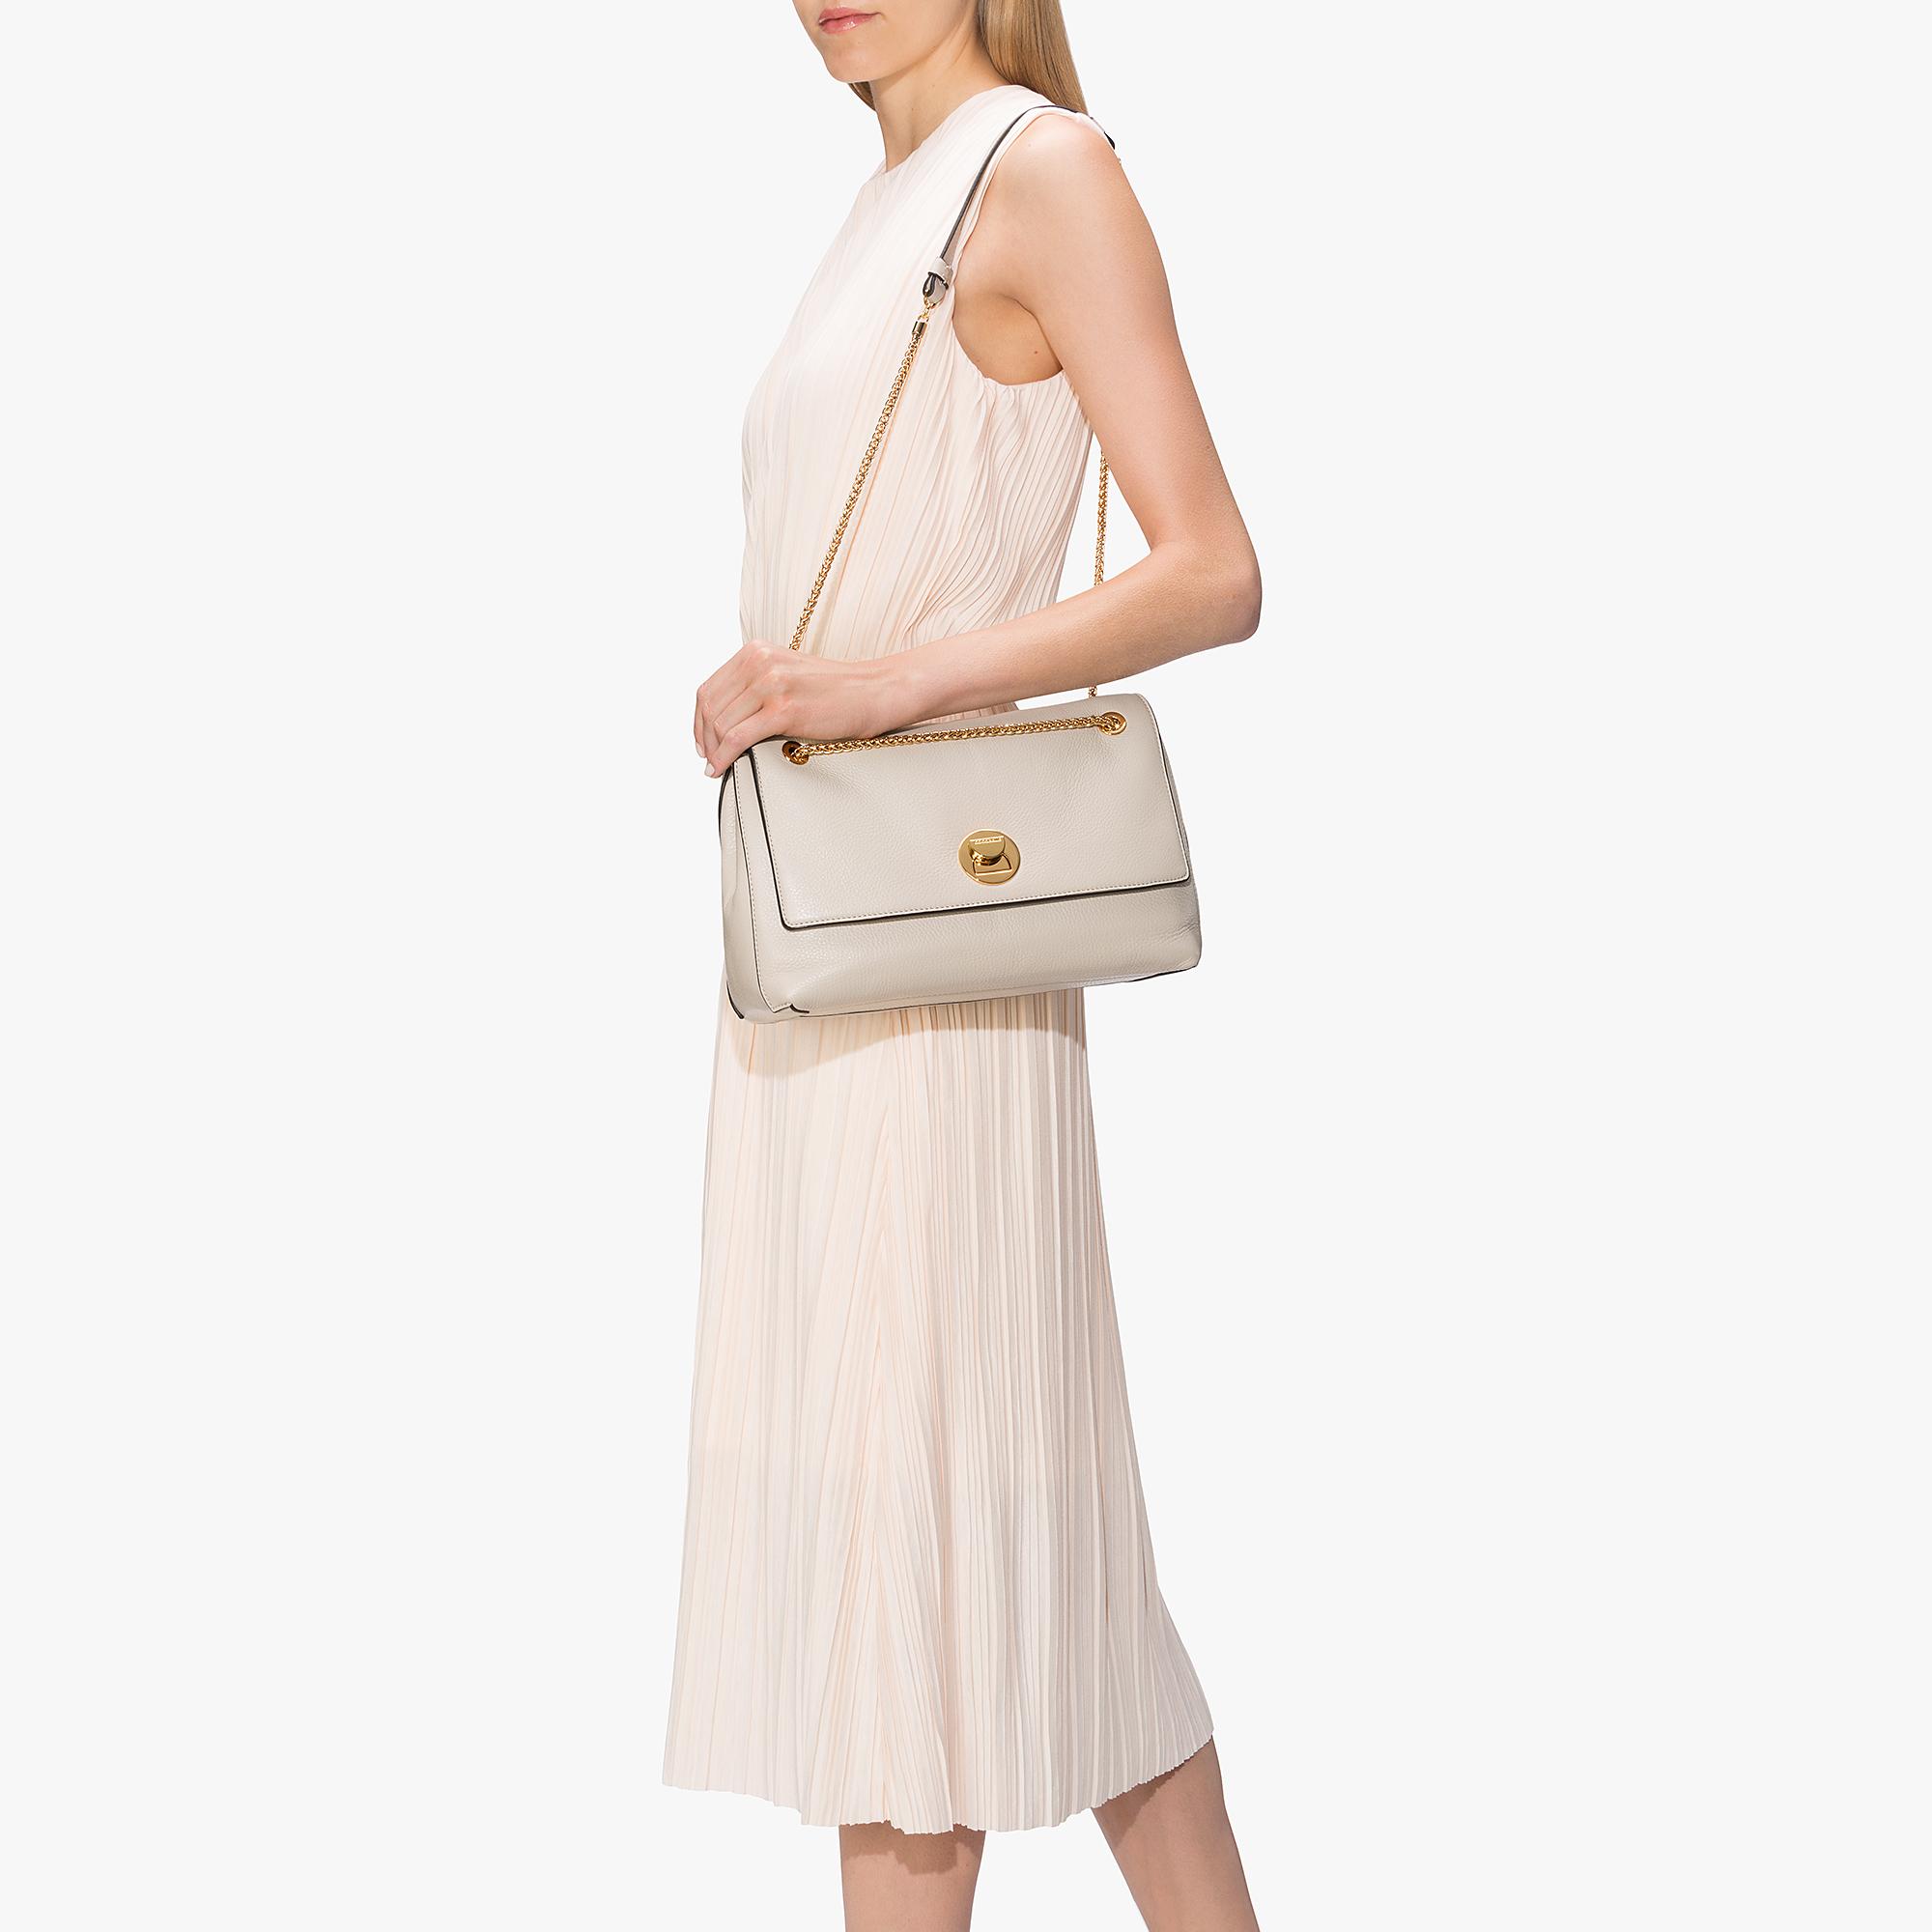 Liya leather bag with a single strap